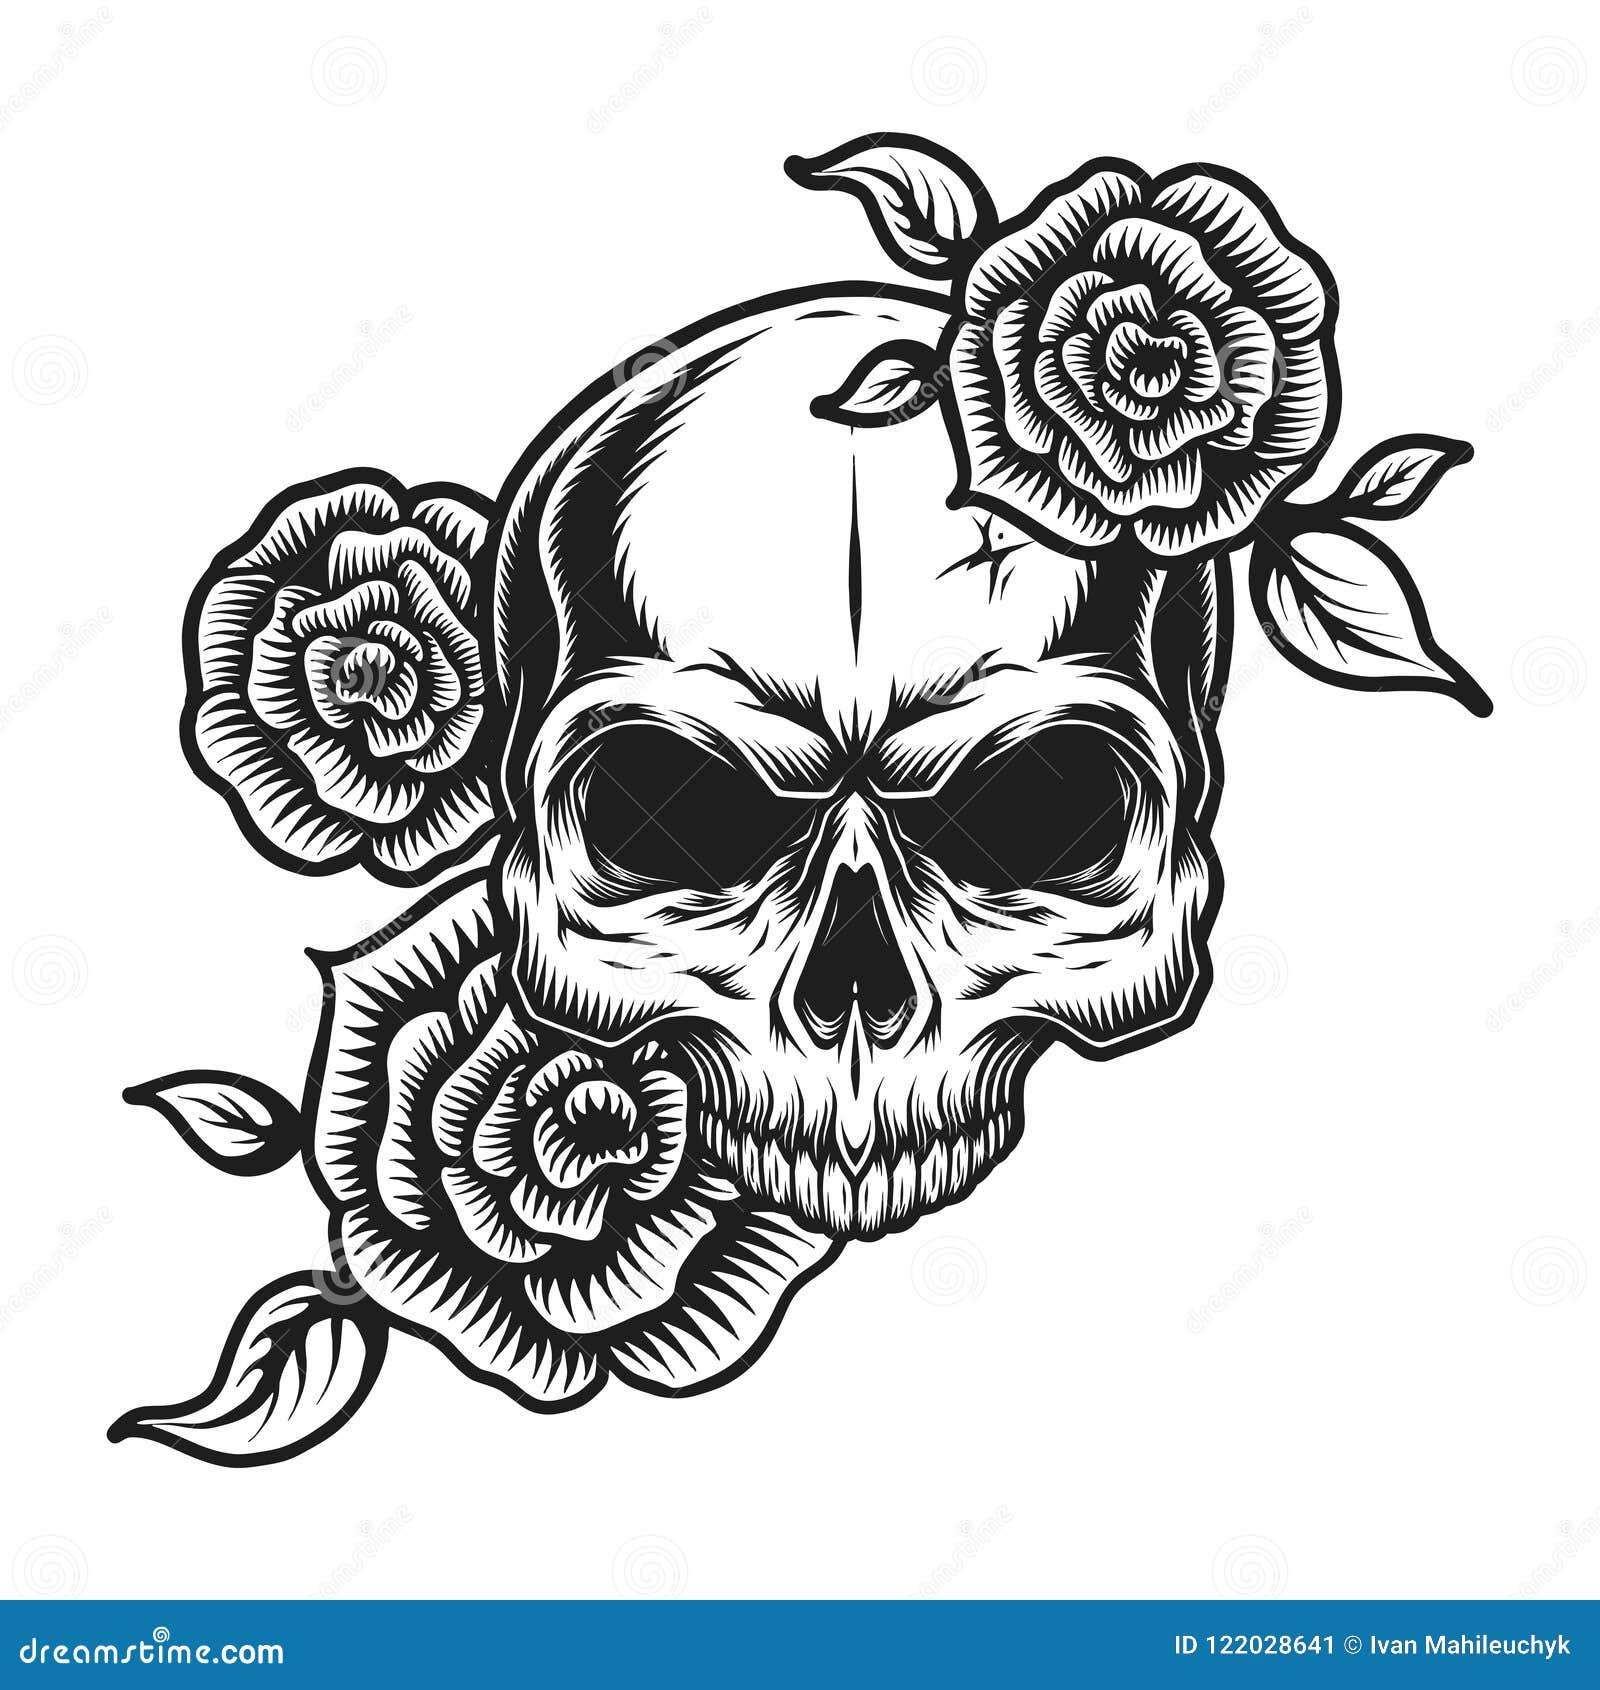 Human Jaw Tattoo: Vintage Human Skull Tattoo Concept Stock Vector